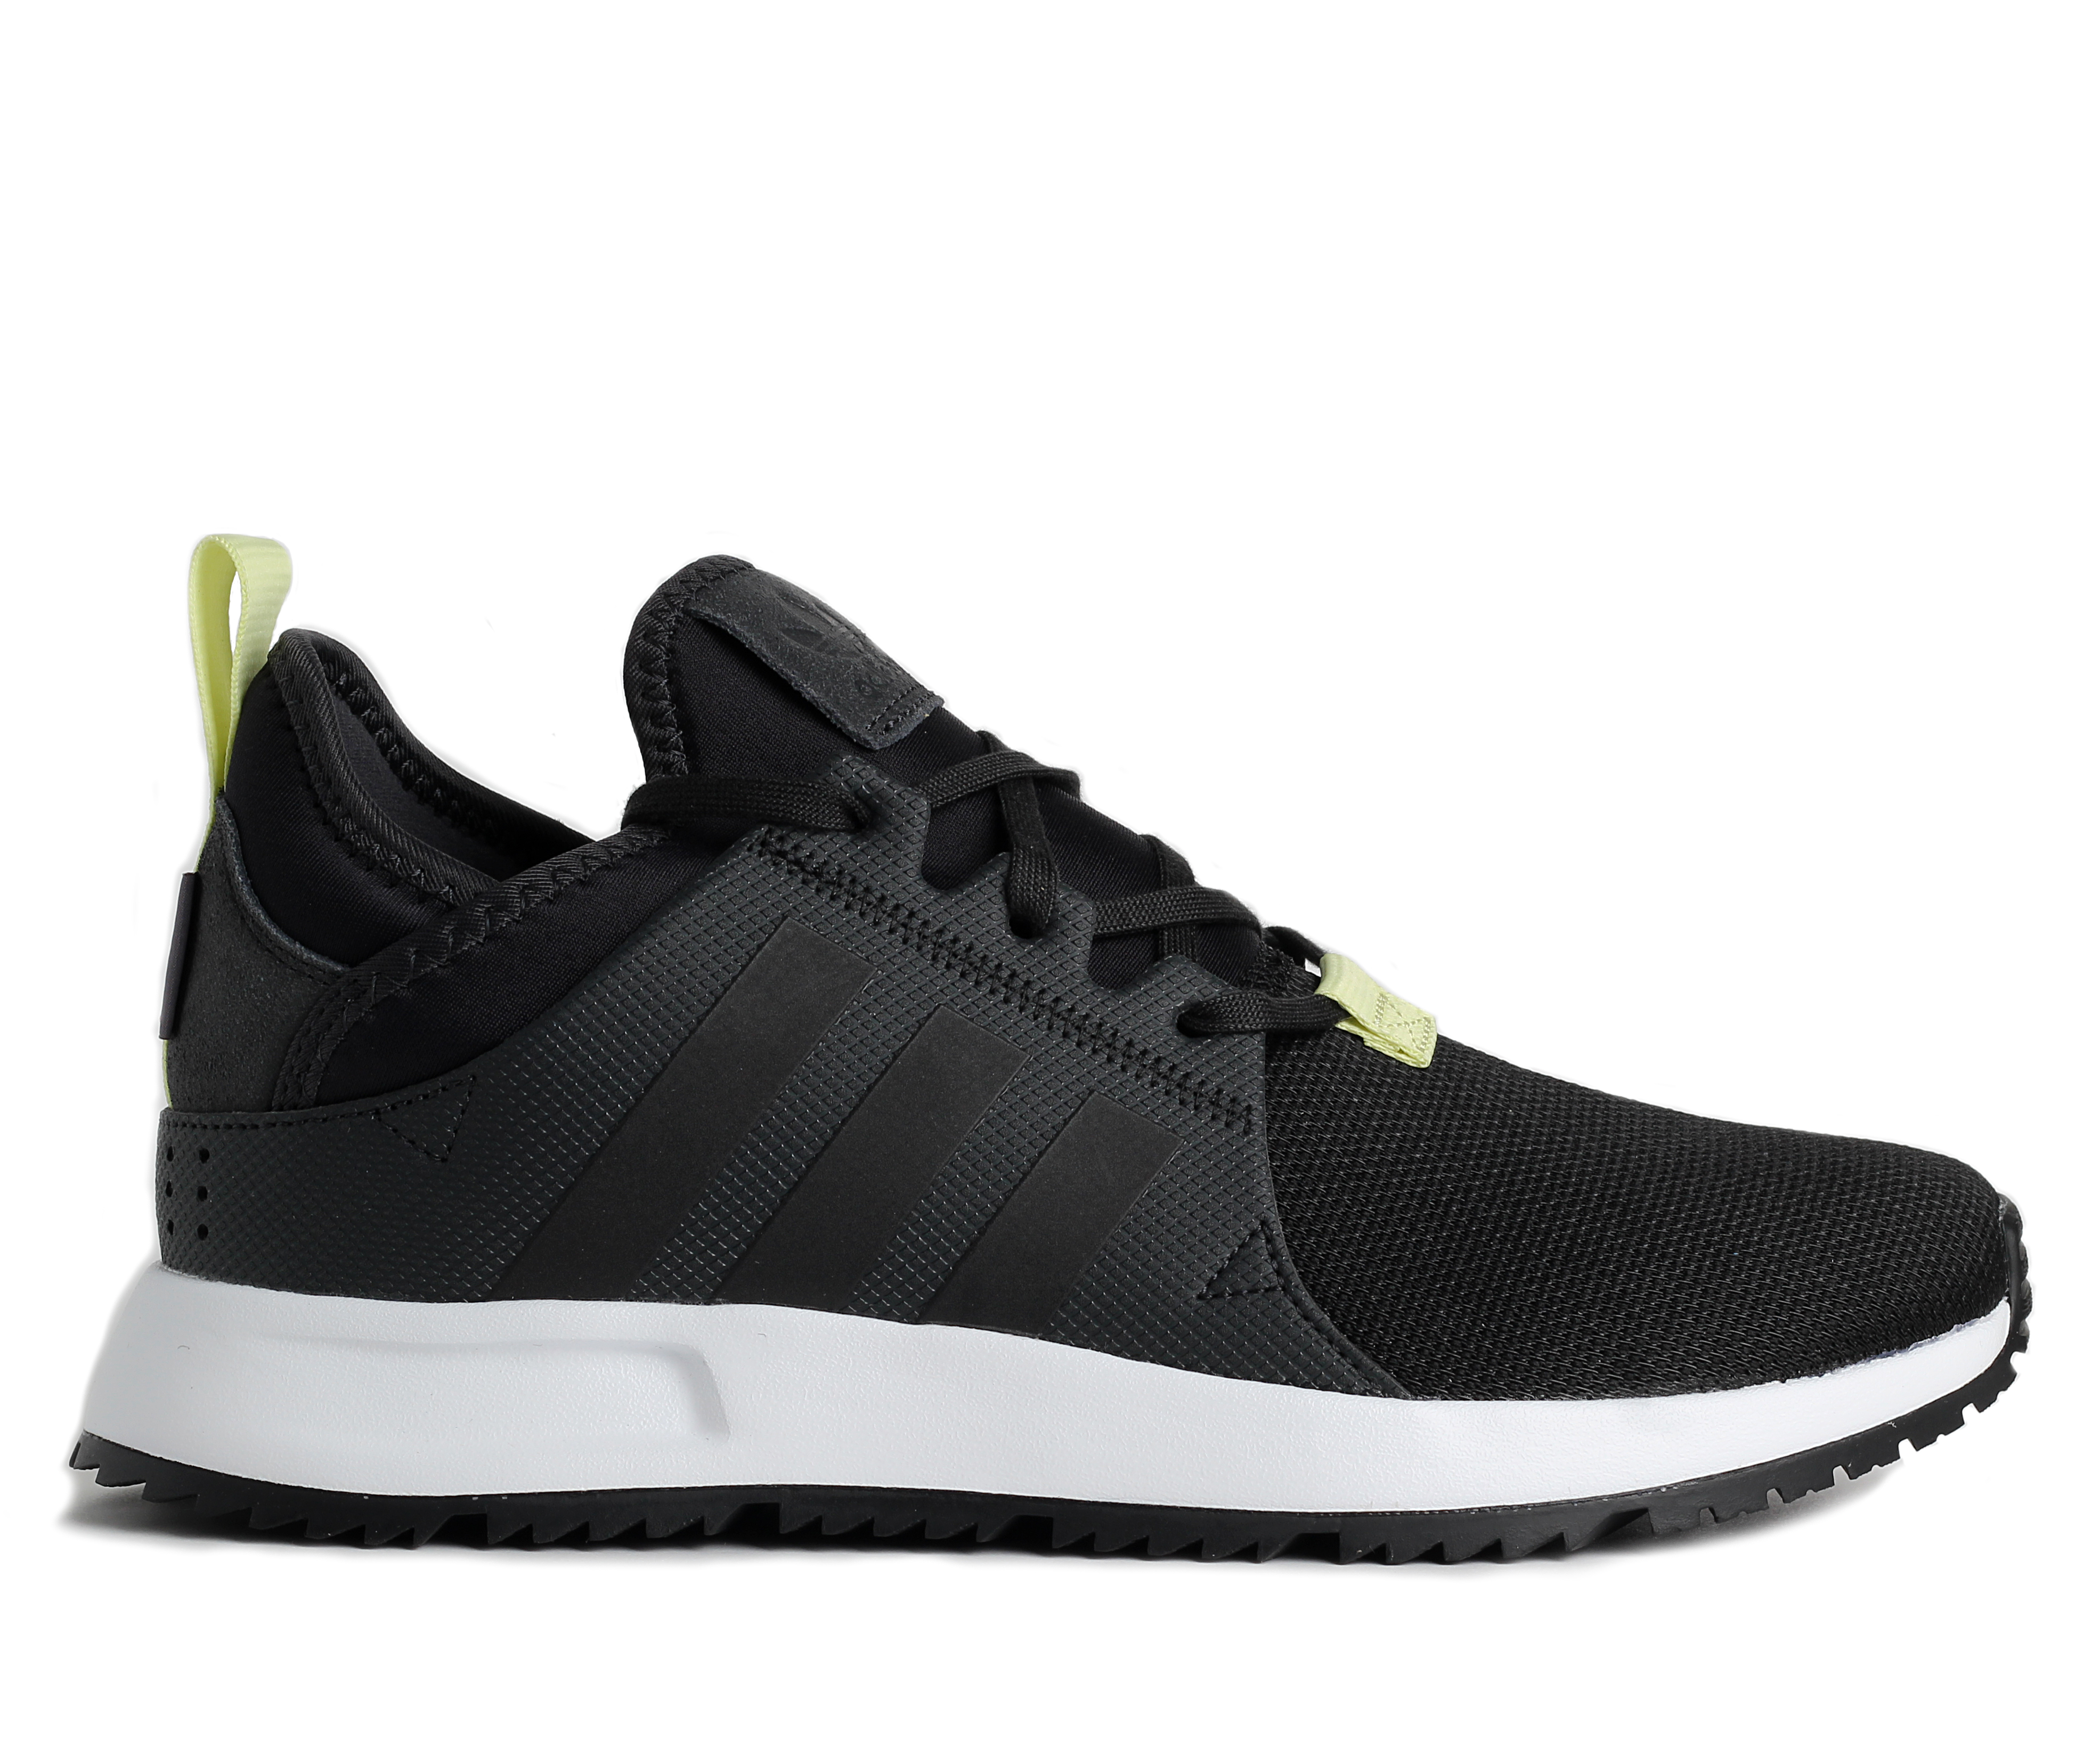 adidas X_PLR Sneakerboot Carbon / Core Black / White